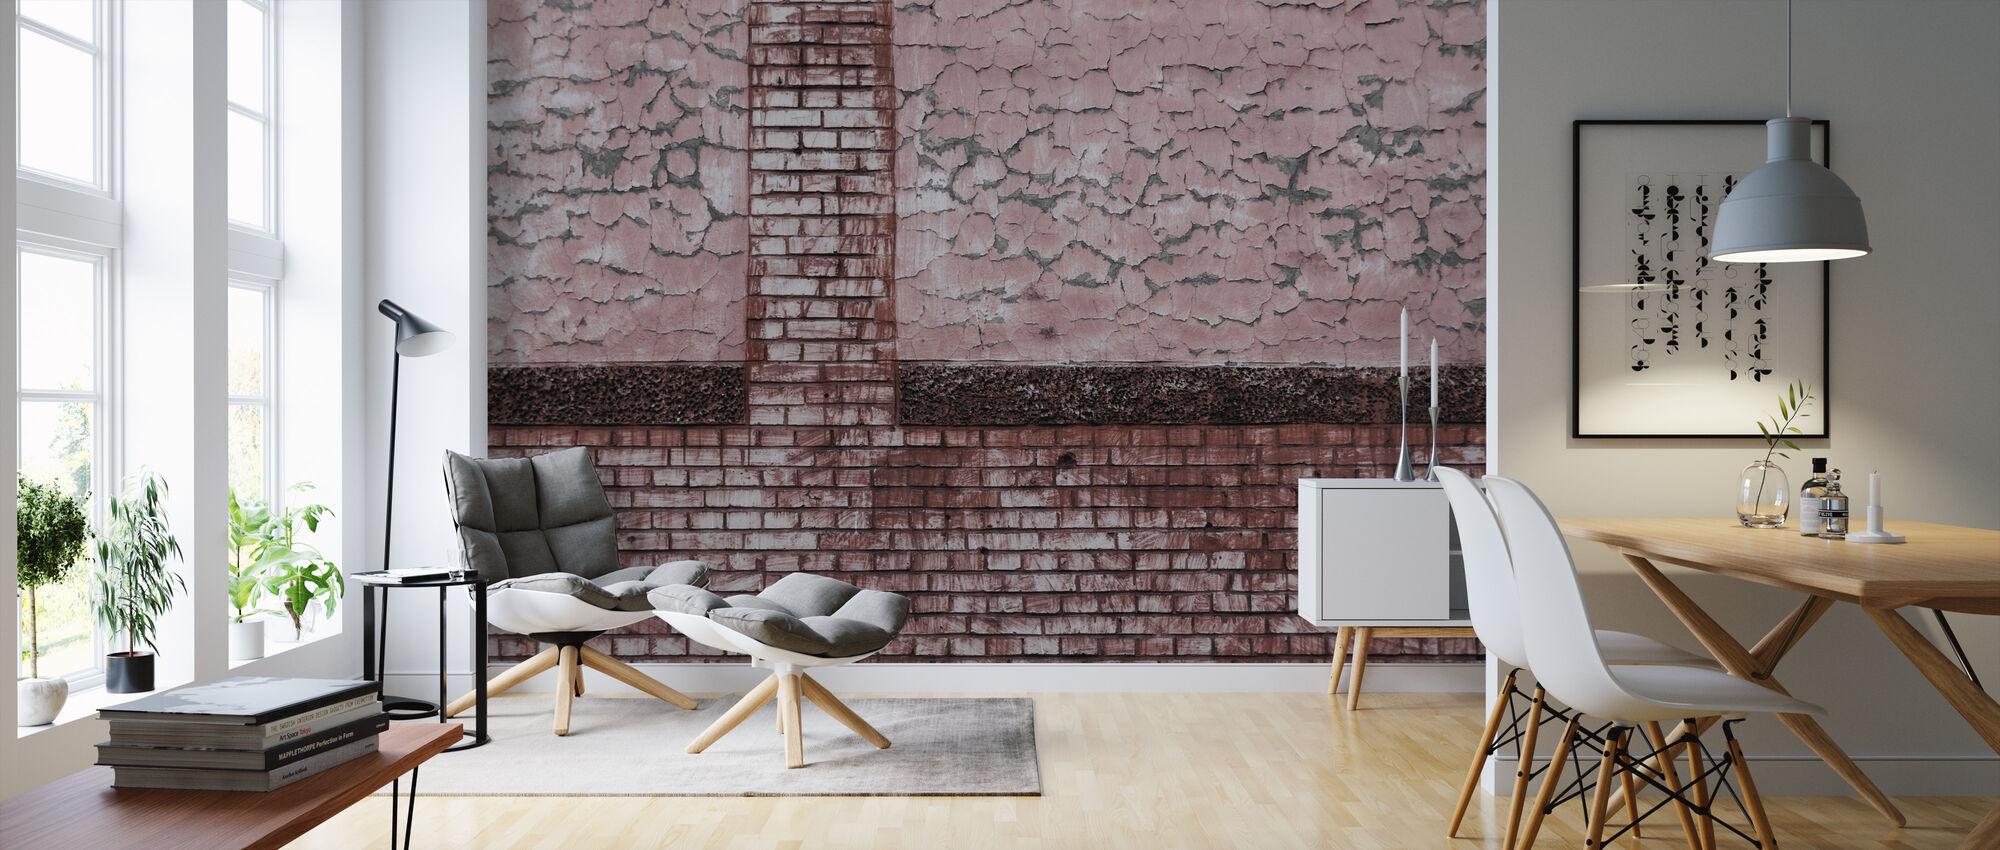 Bricks and Pattern - Wallpaper - Living Room